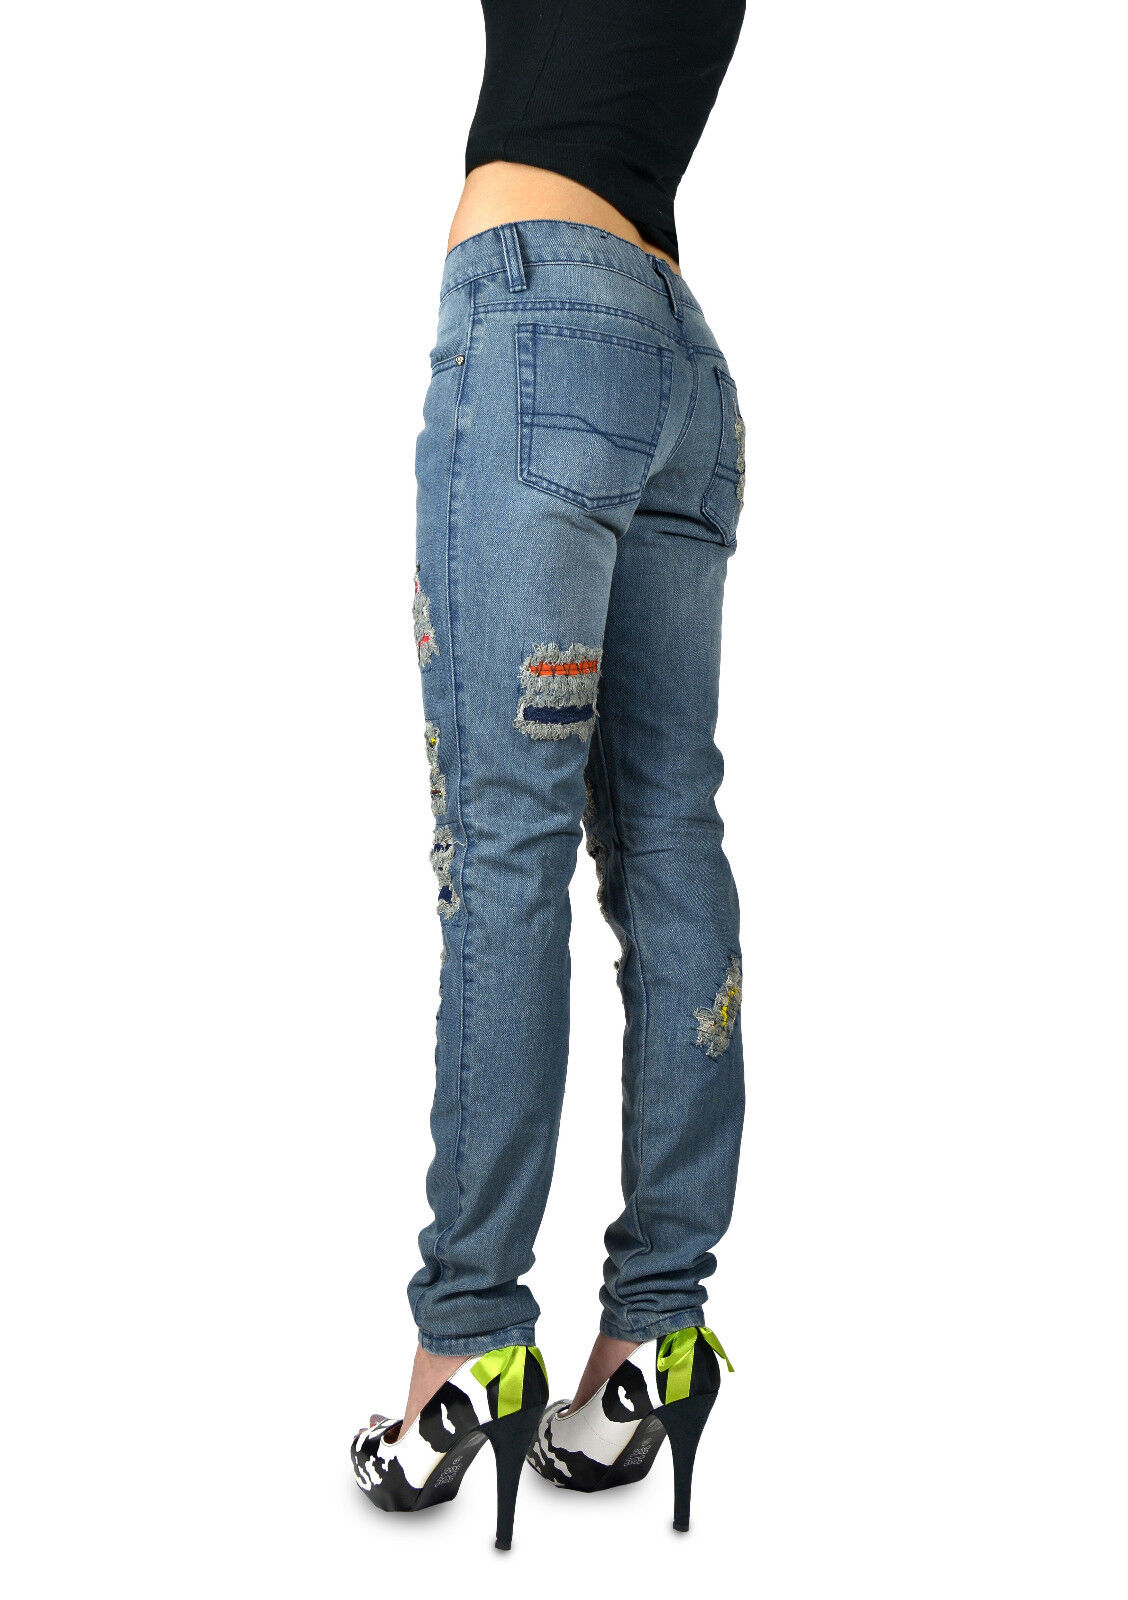 TRIPP INDIGO BLUE PUNK ROCK STAR EMO ART HOLES PATCH JEANS PANTS BS9248 Clothing, Shoes & Accessories